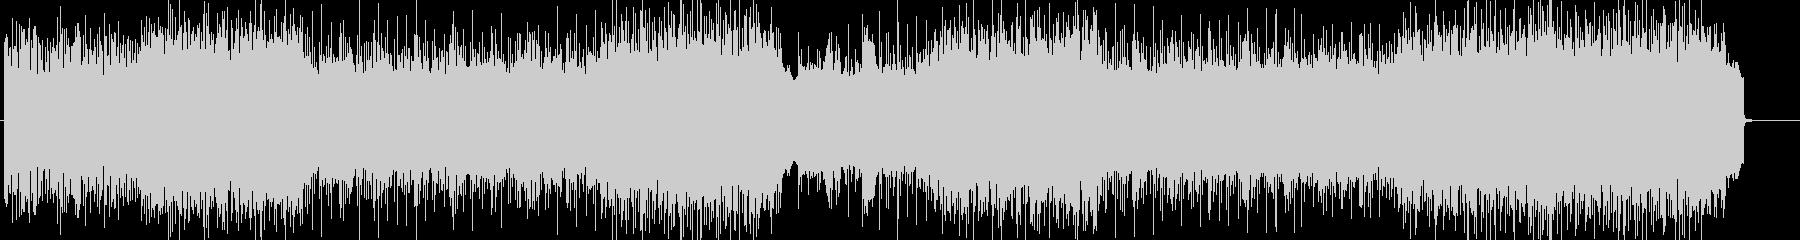 「HR/HM」「ROCK」BGM145の未再生の波形